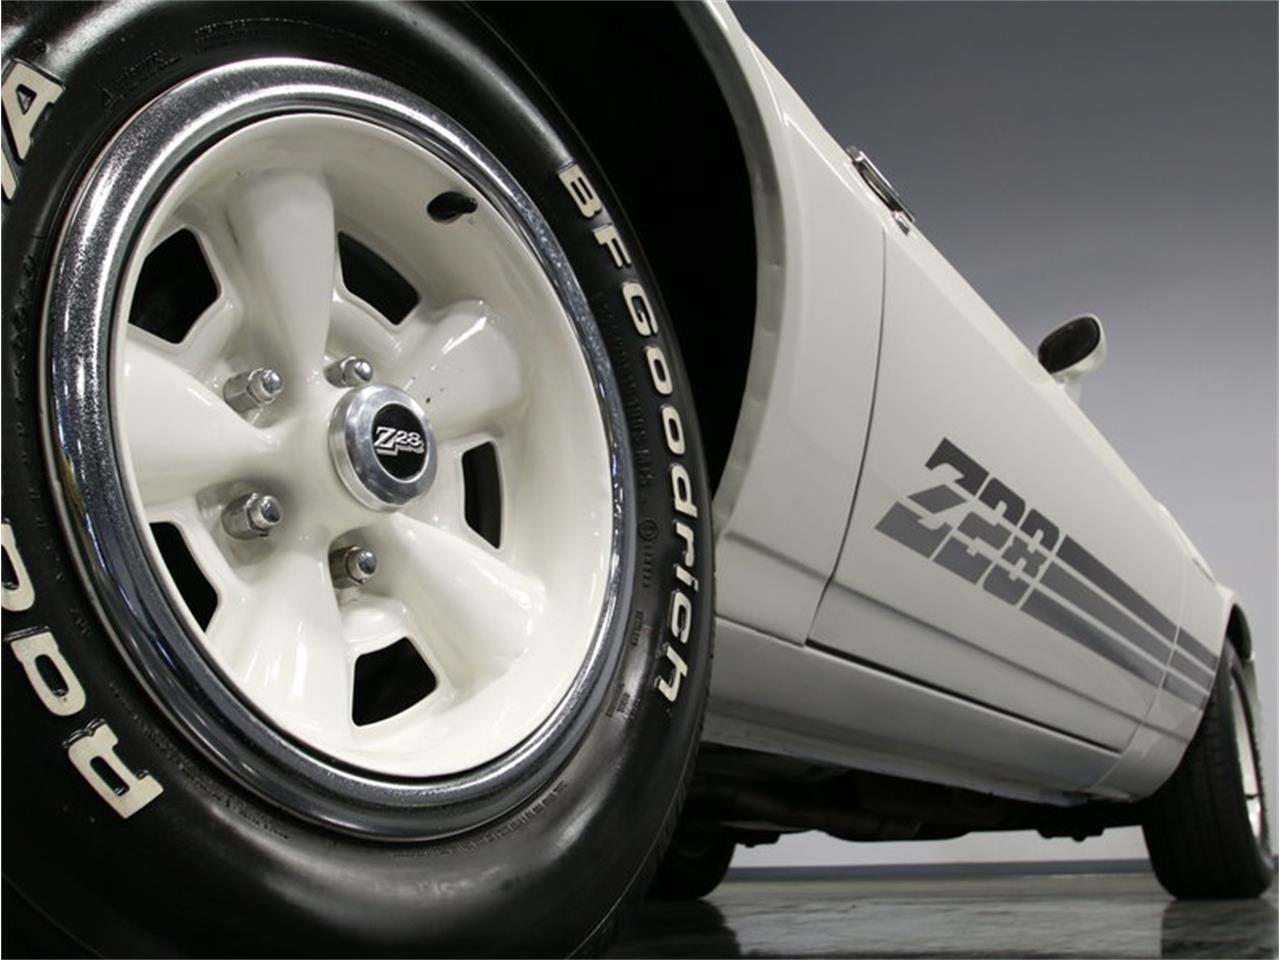 Large Picture of '78 Chevrolet Camaro Z28 located in Concord North Carolina - $16,995.00 - L5M0